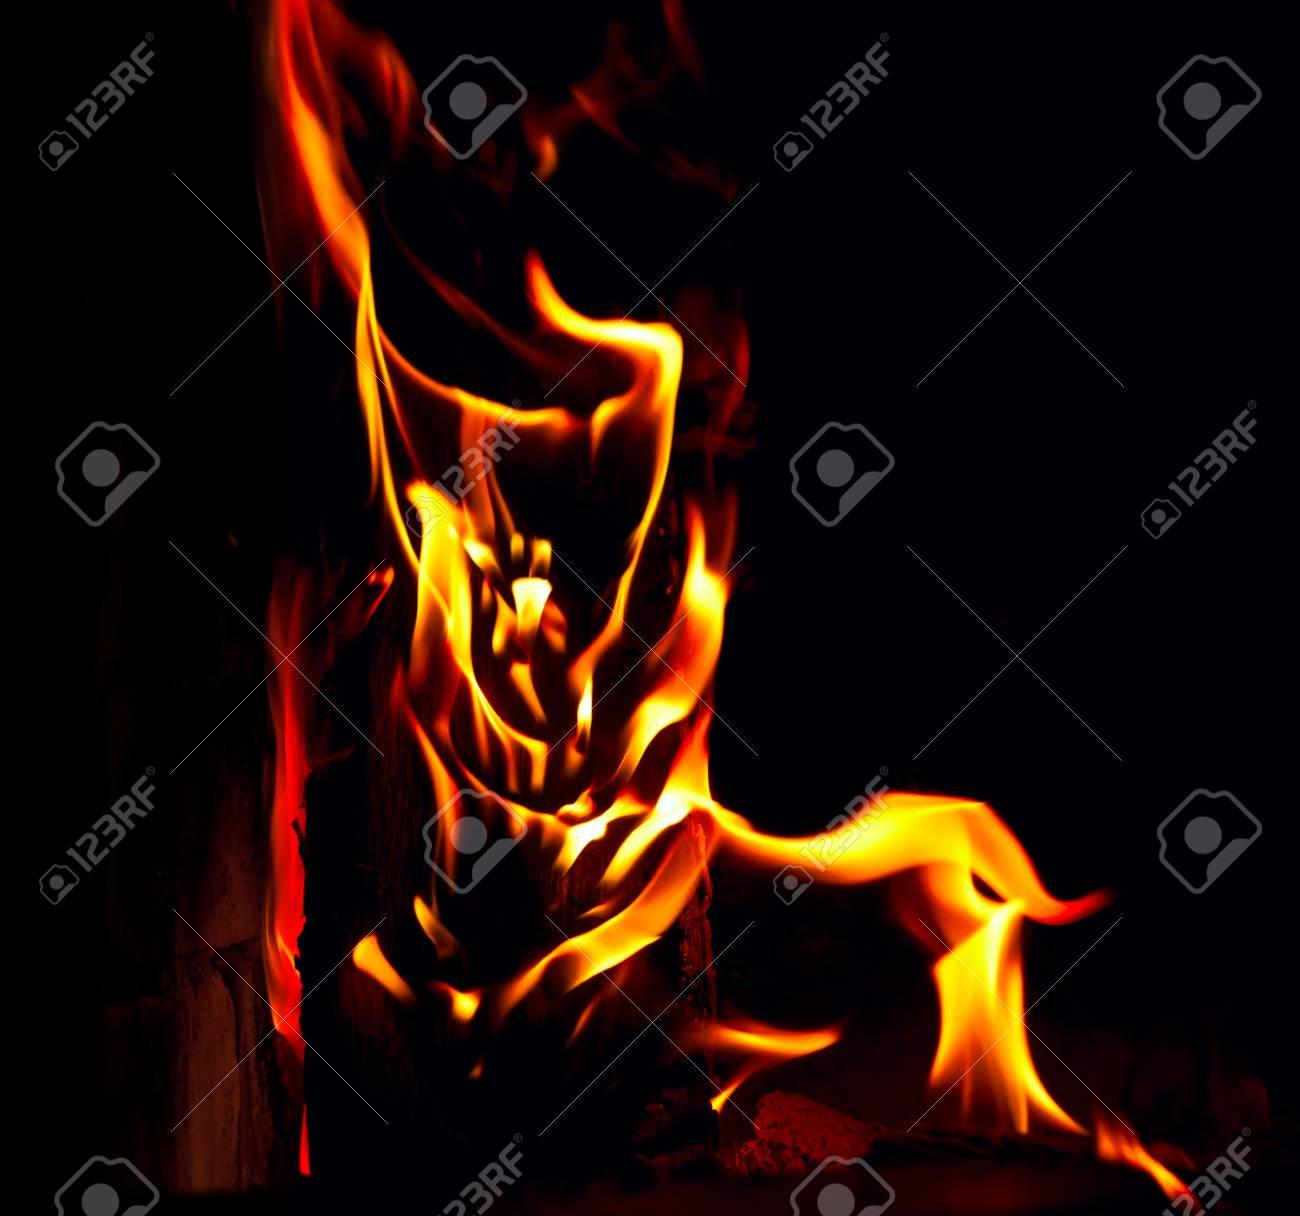 Flame on black background Stock Photo - 17504418